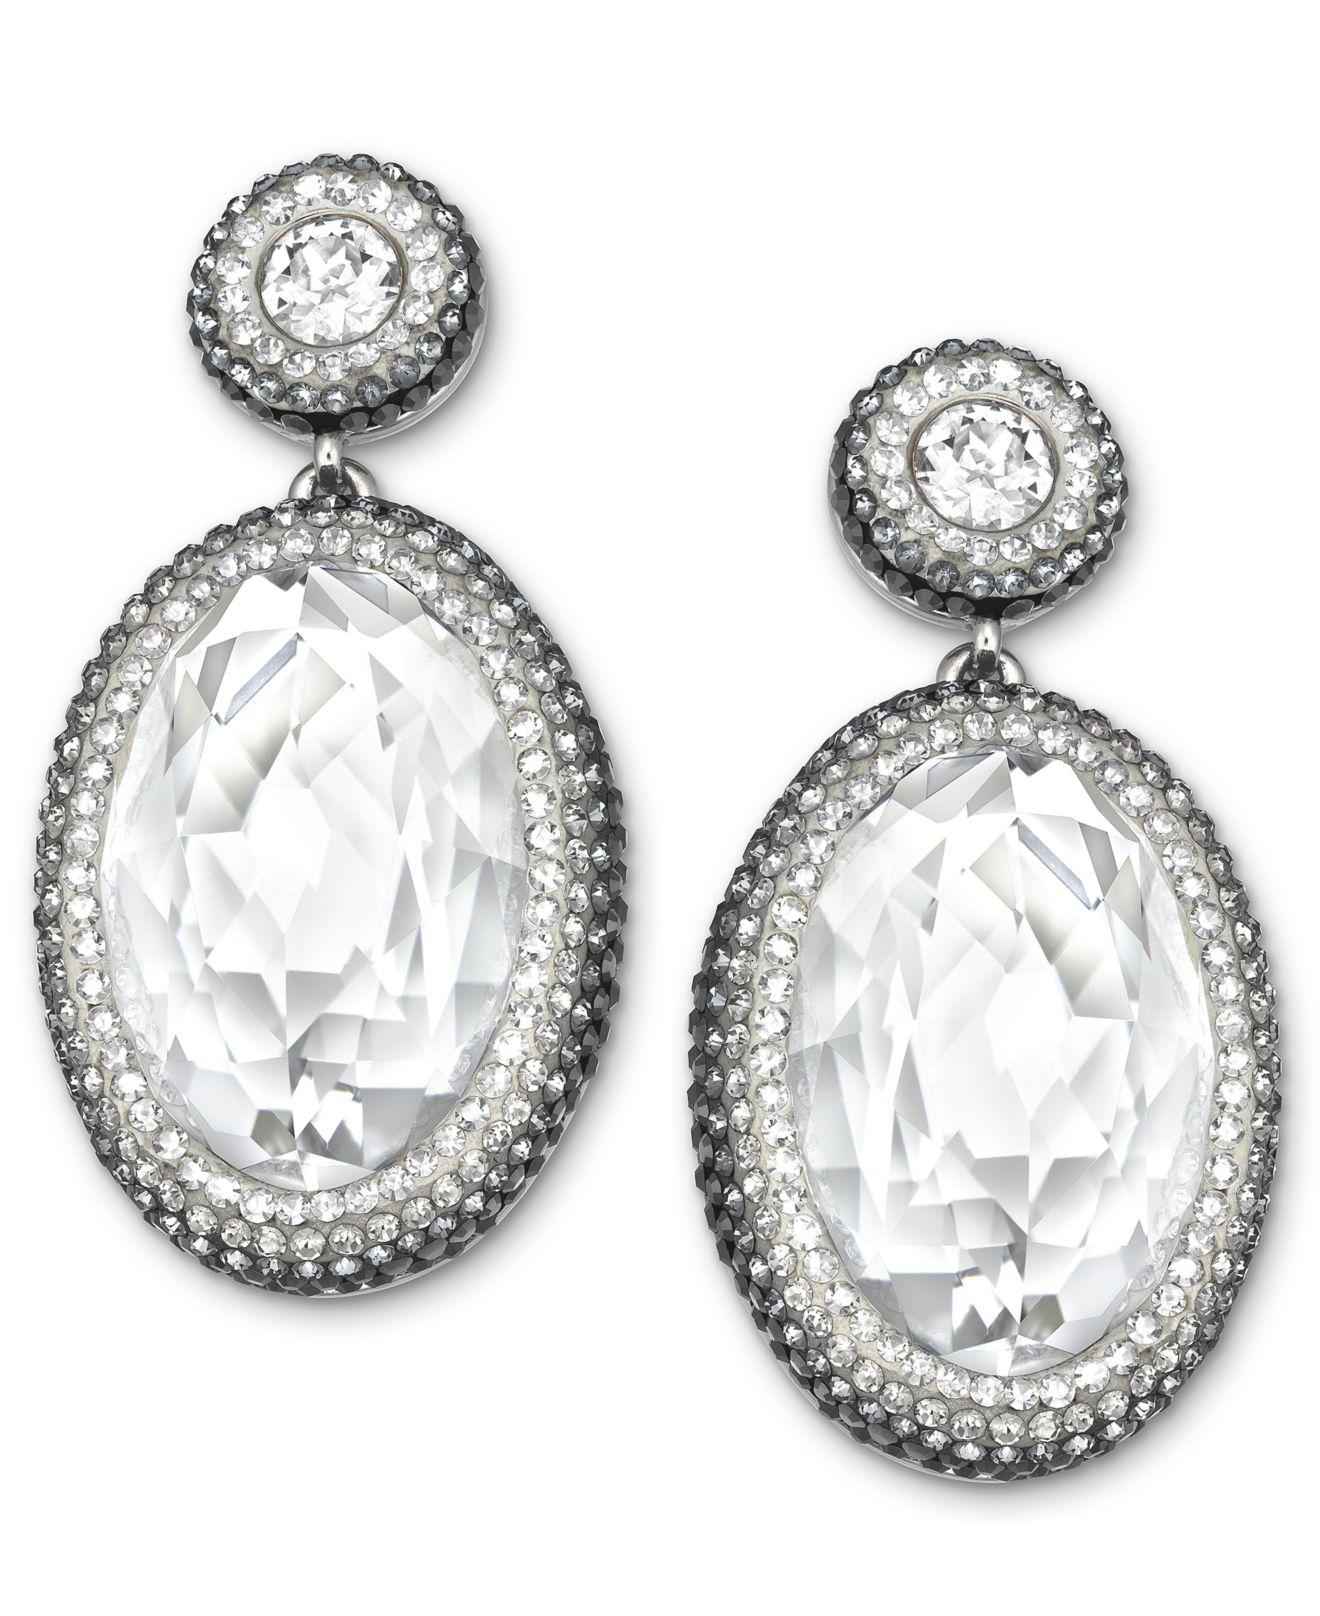 59bc4a99e Swarovski Palladium-Plated Clear Crystal Oval Drop Earrings - Lyst